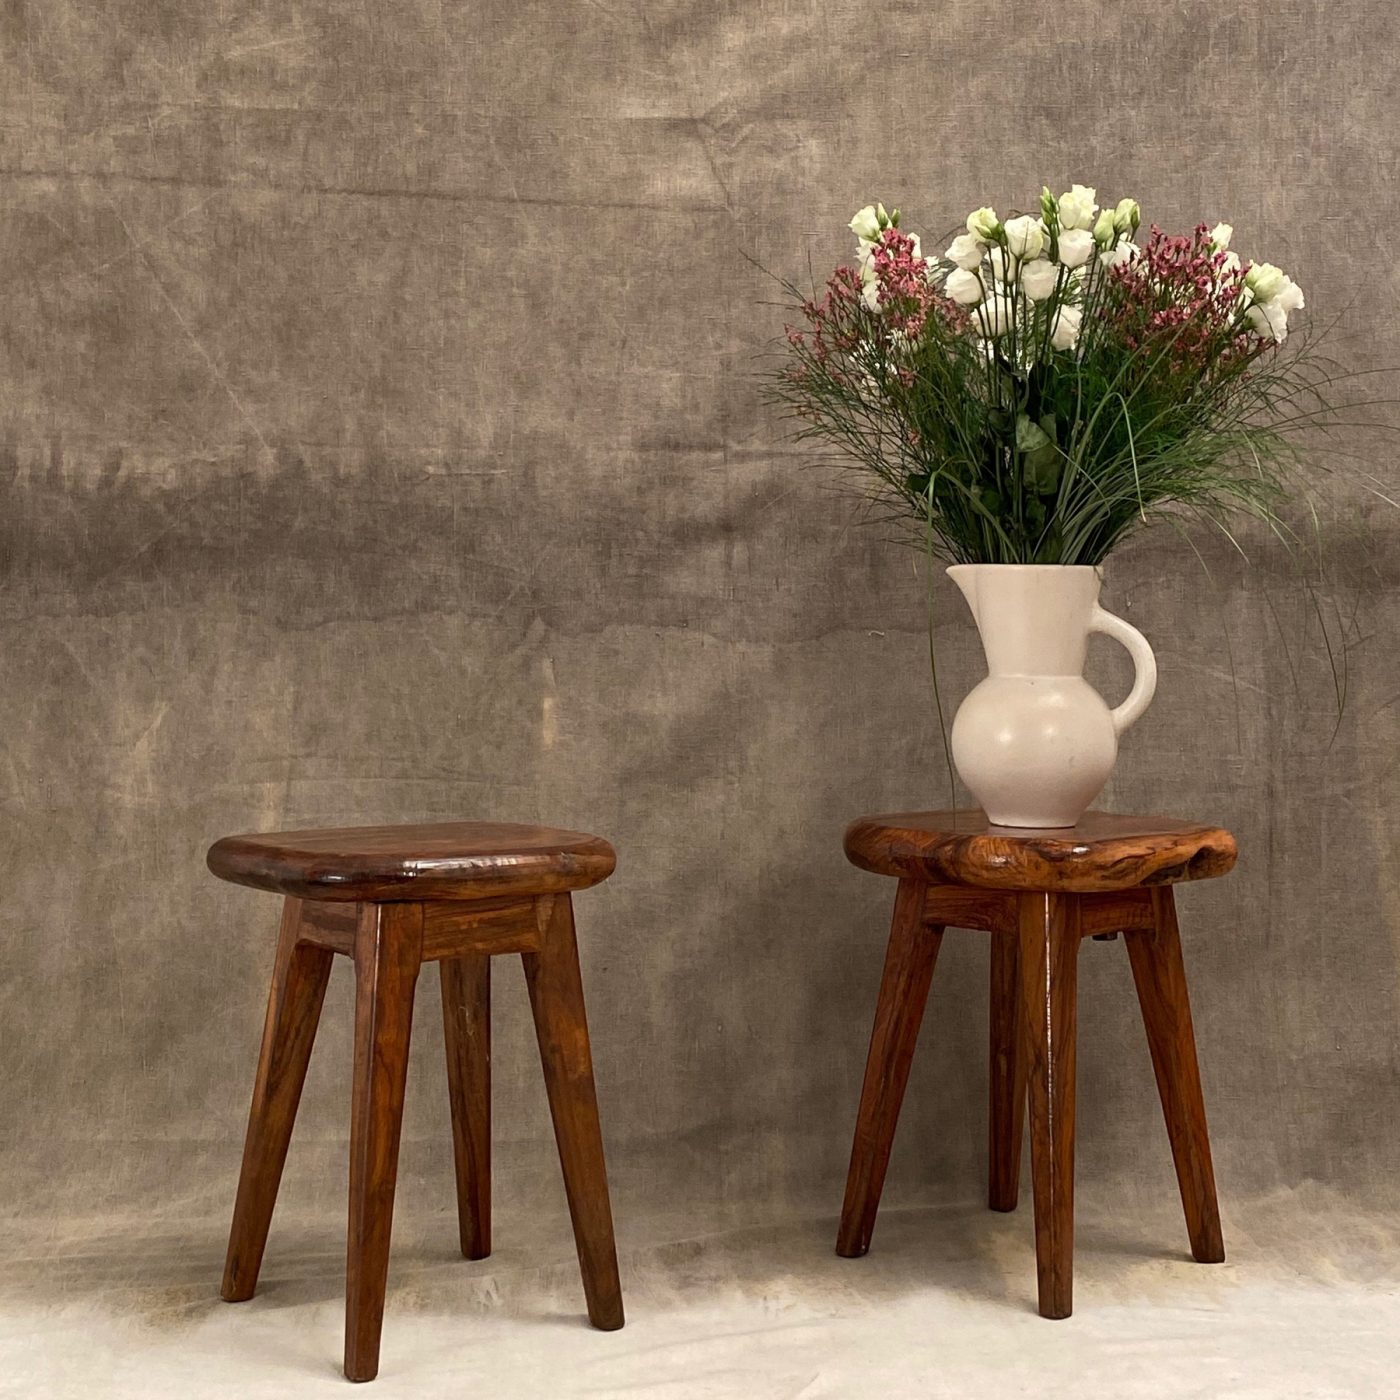 primitive-olive-stools0001